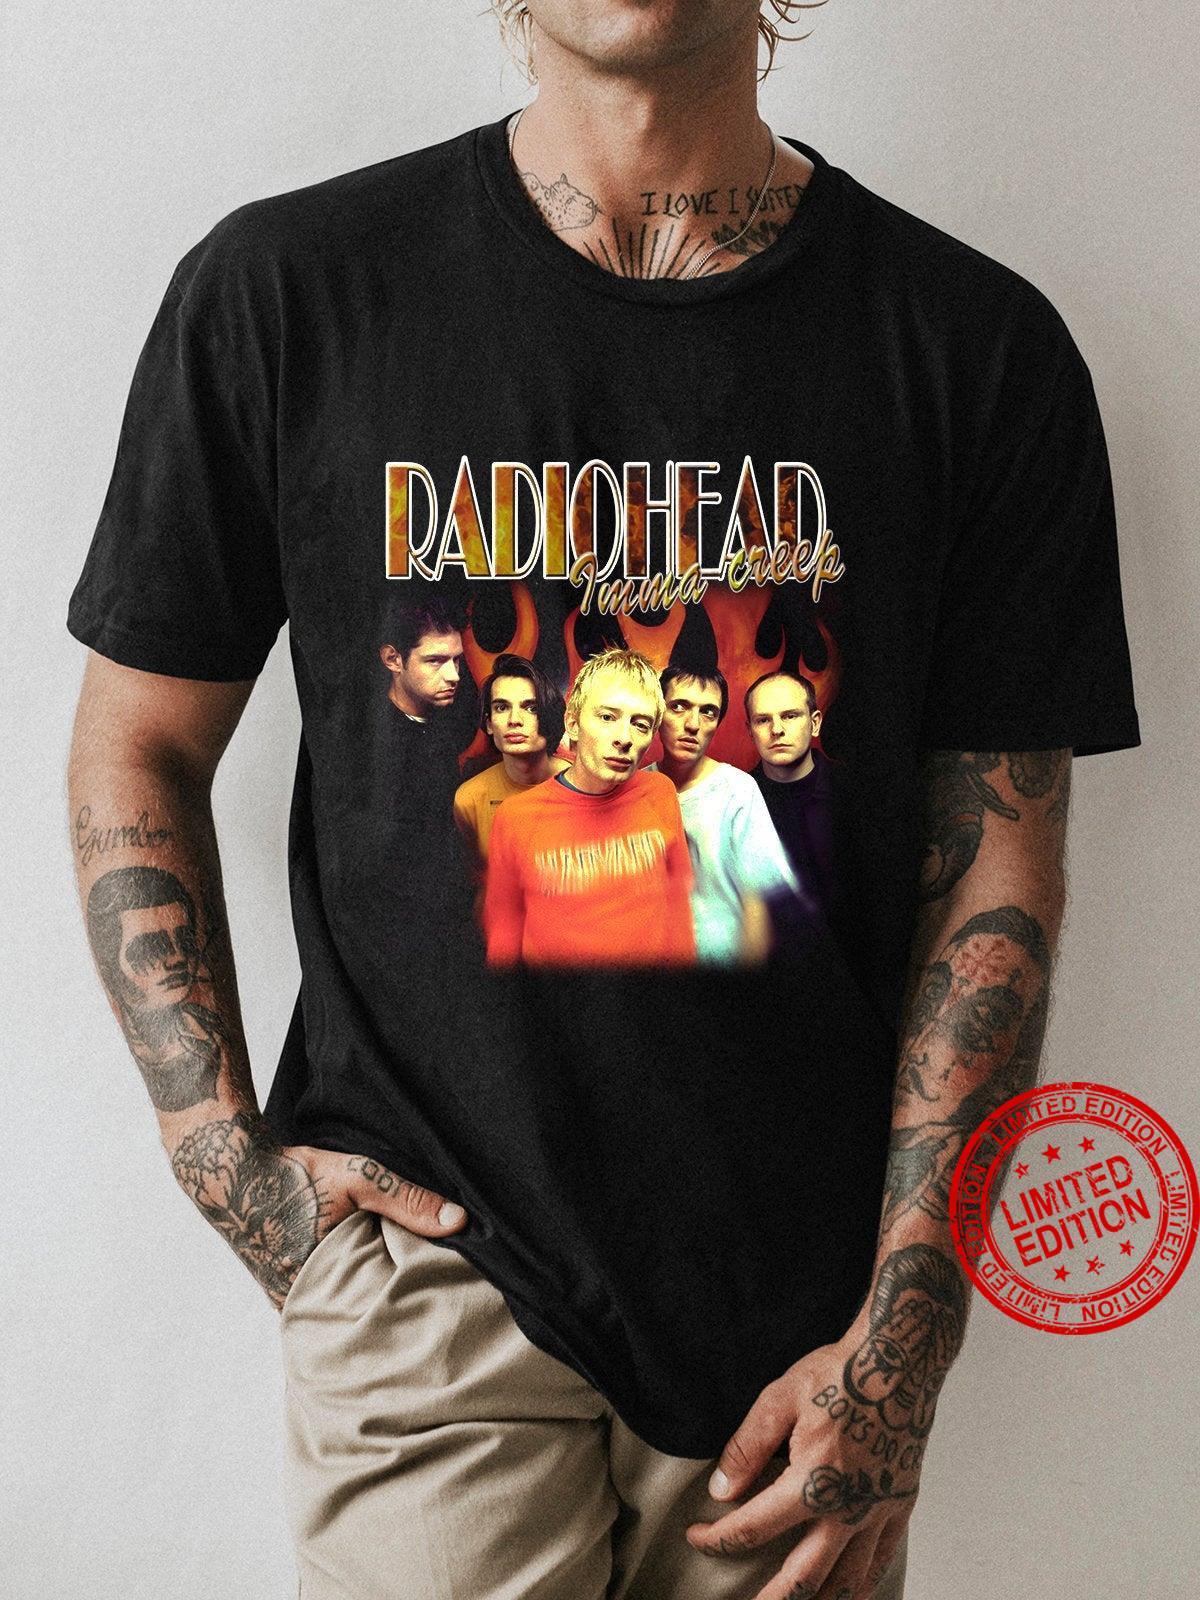 Vintage Radiohead Shirt